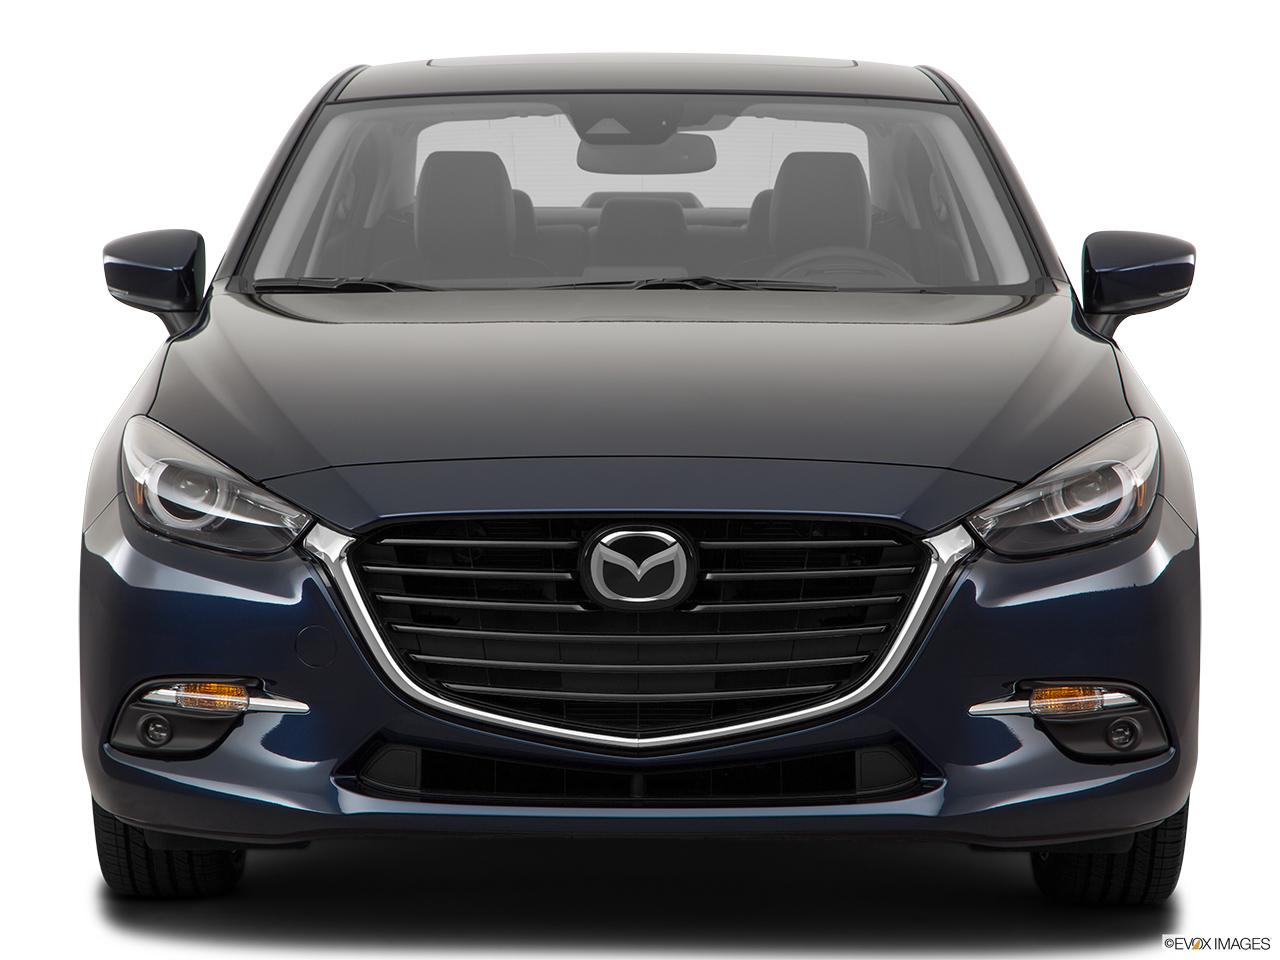 mazda 3 sedan 2017 1 6l prestige plus in saudi arabia new car prices specs reviews photos. Black Bedroom Furniture Sets. Home Design Ideas